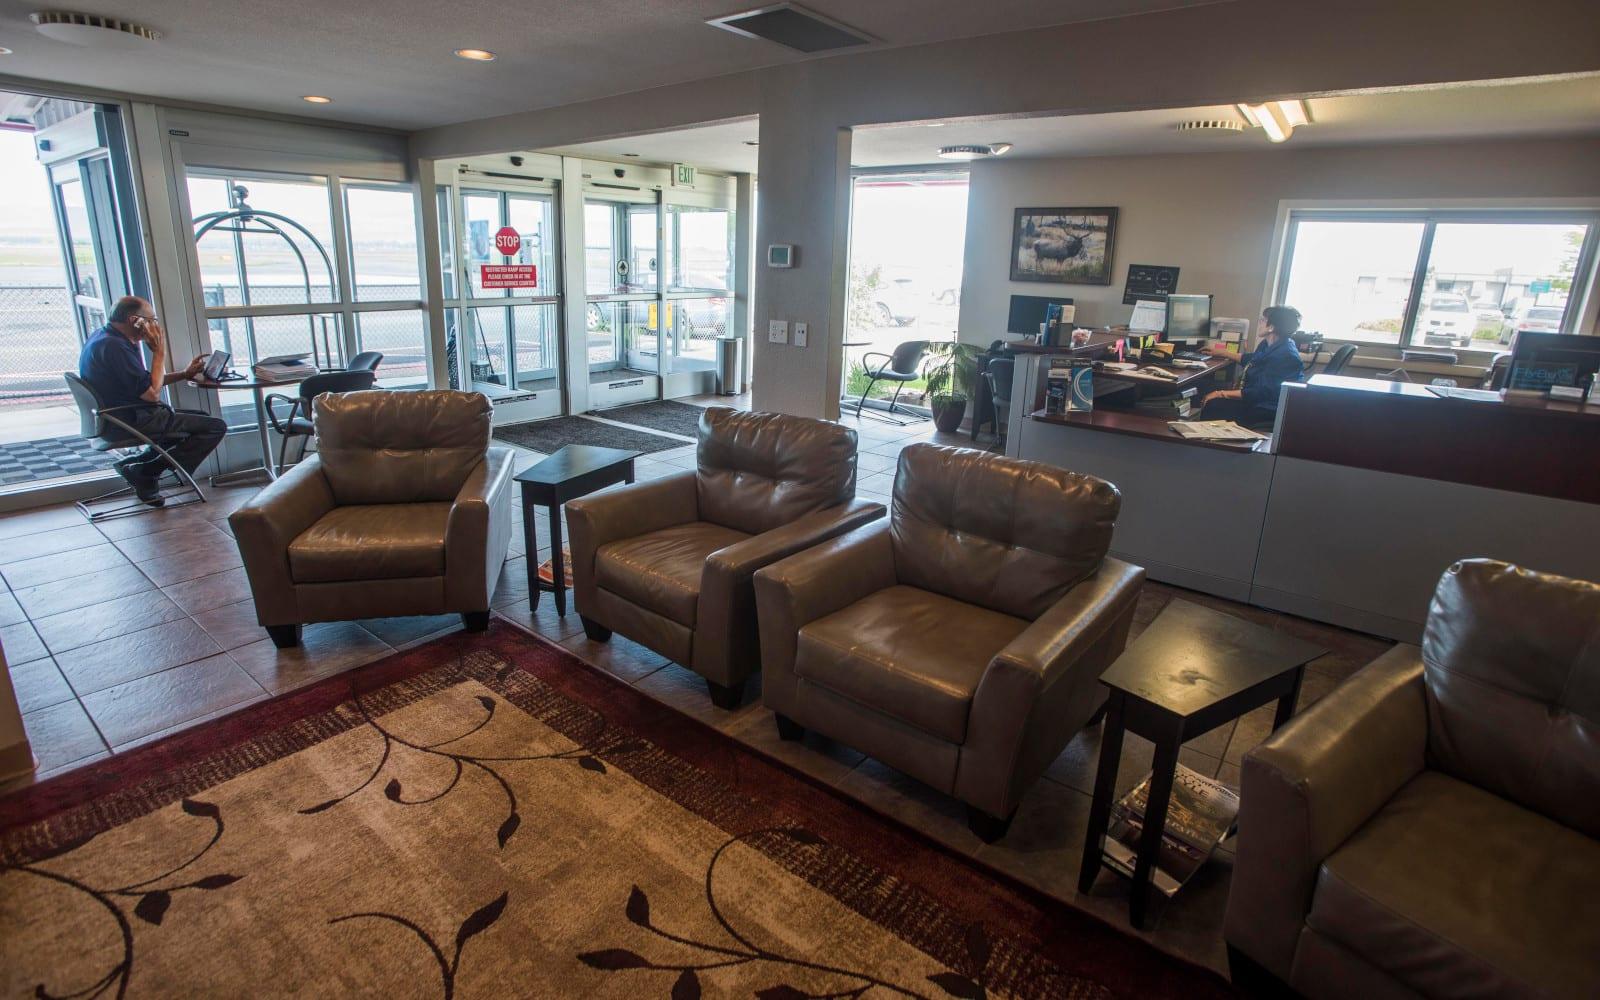 Northern Colorado Regional Airport Terminal Interior Lounge